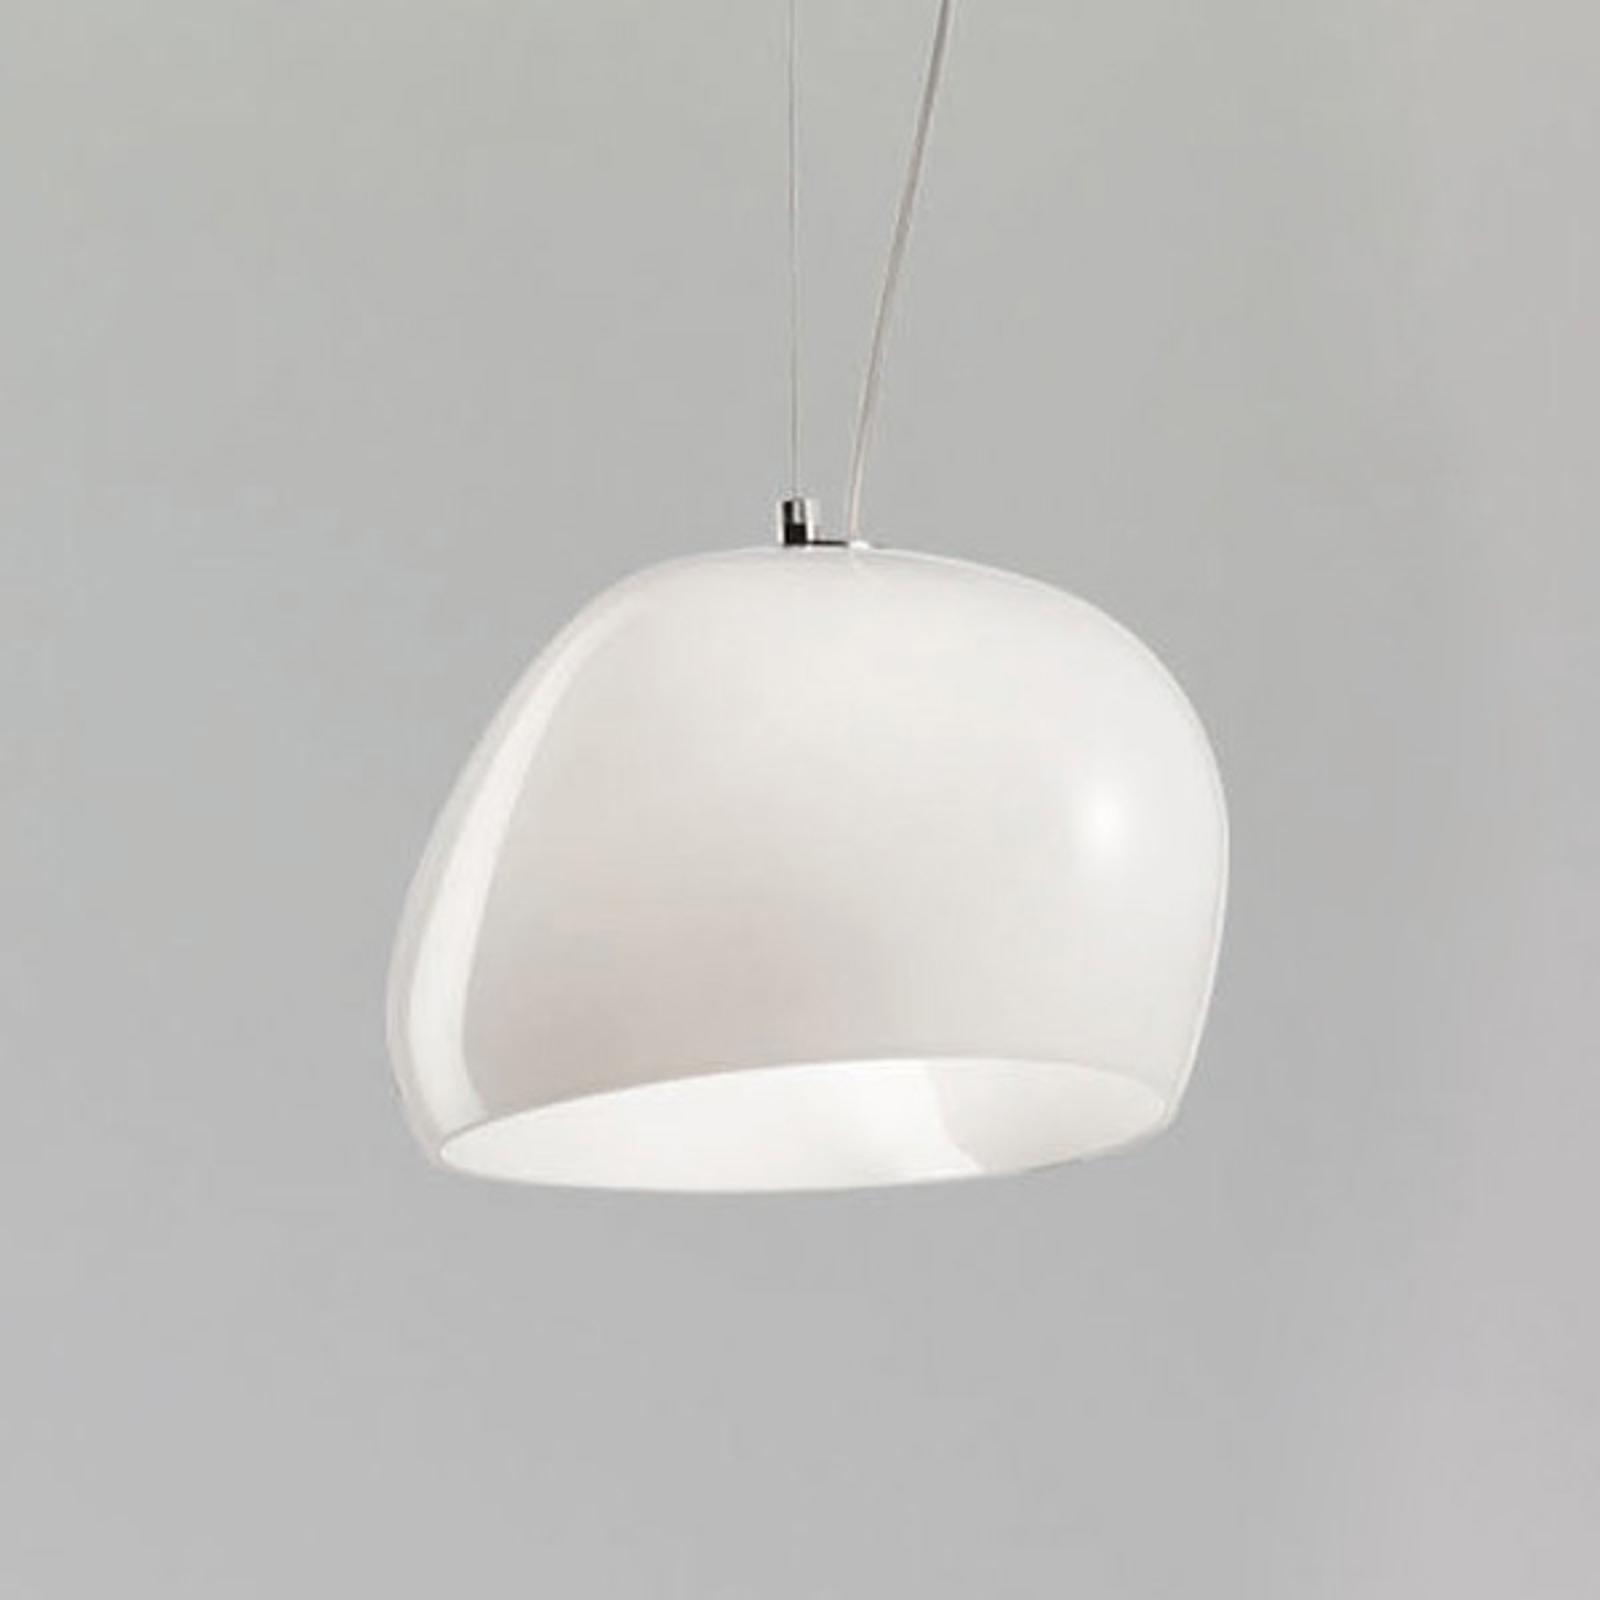 Lampa wisząca Surface Ø27 m E27 biała/matowa biała